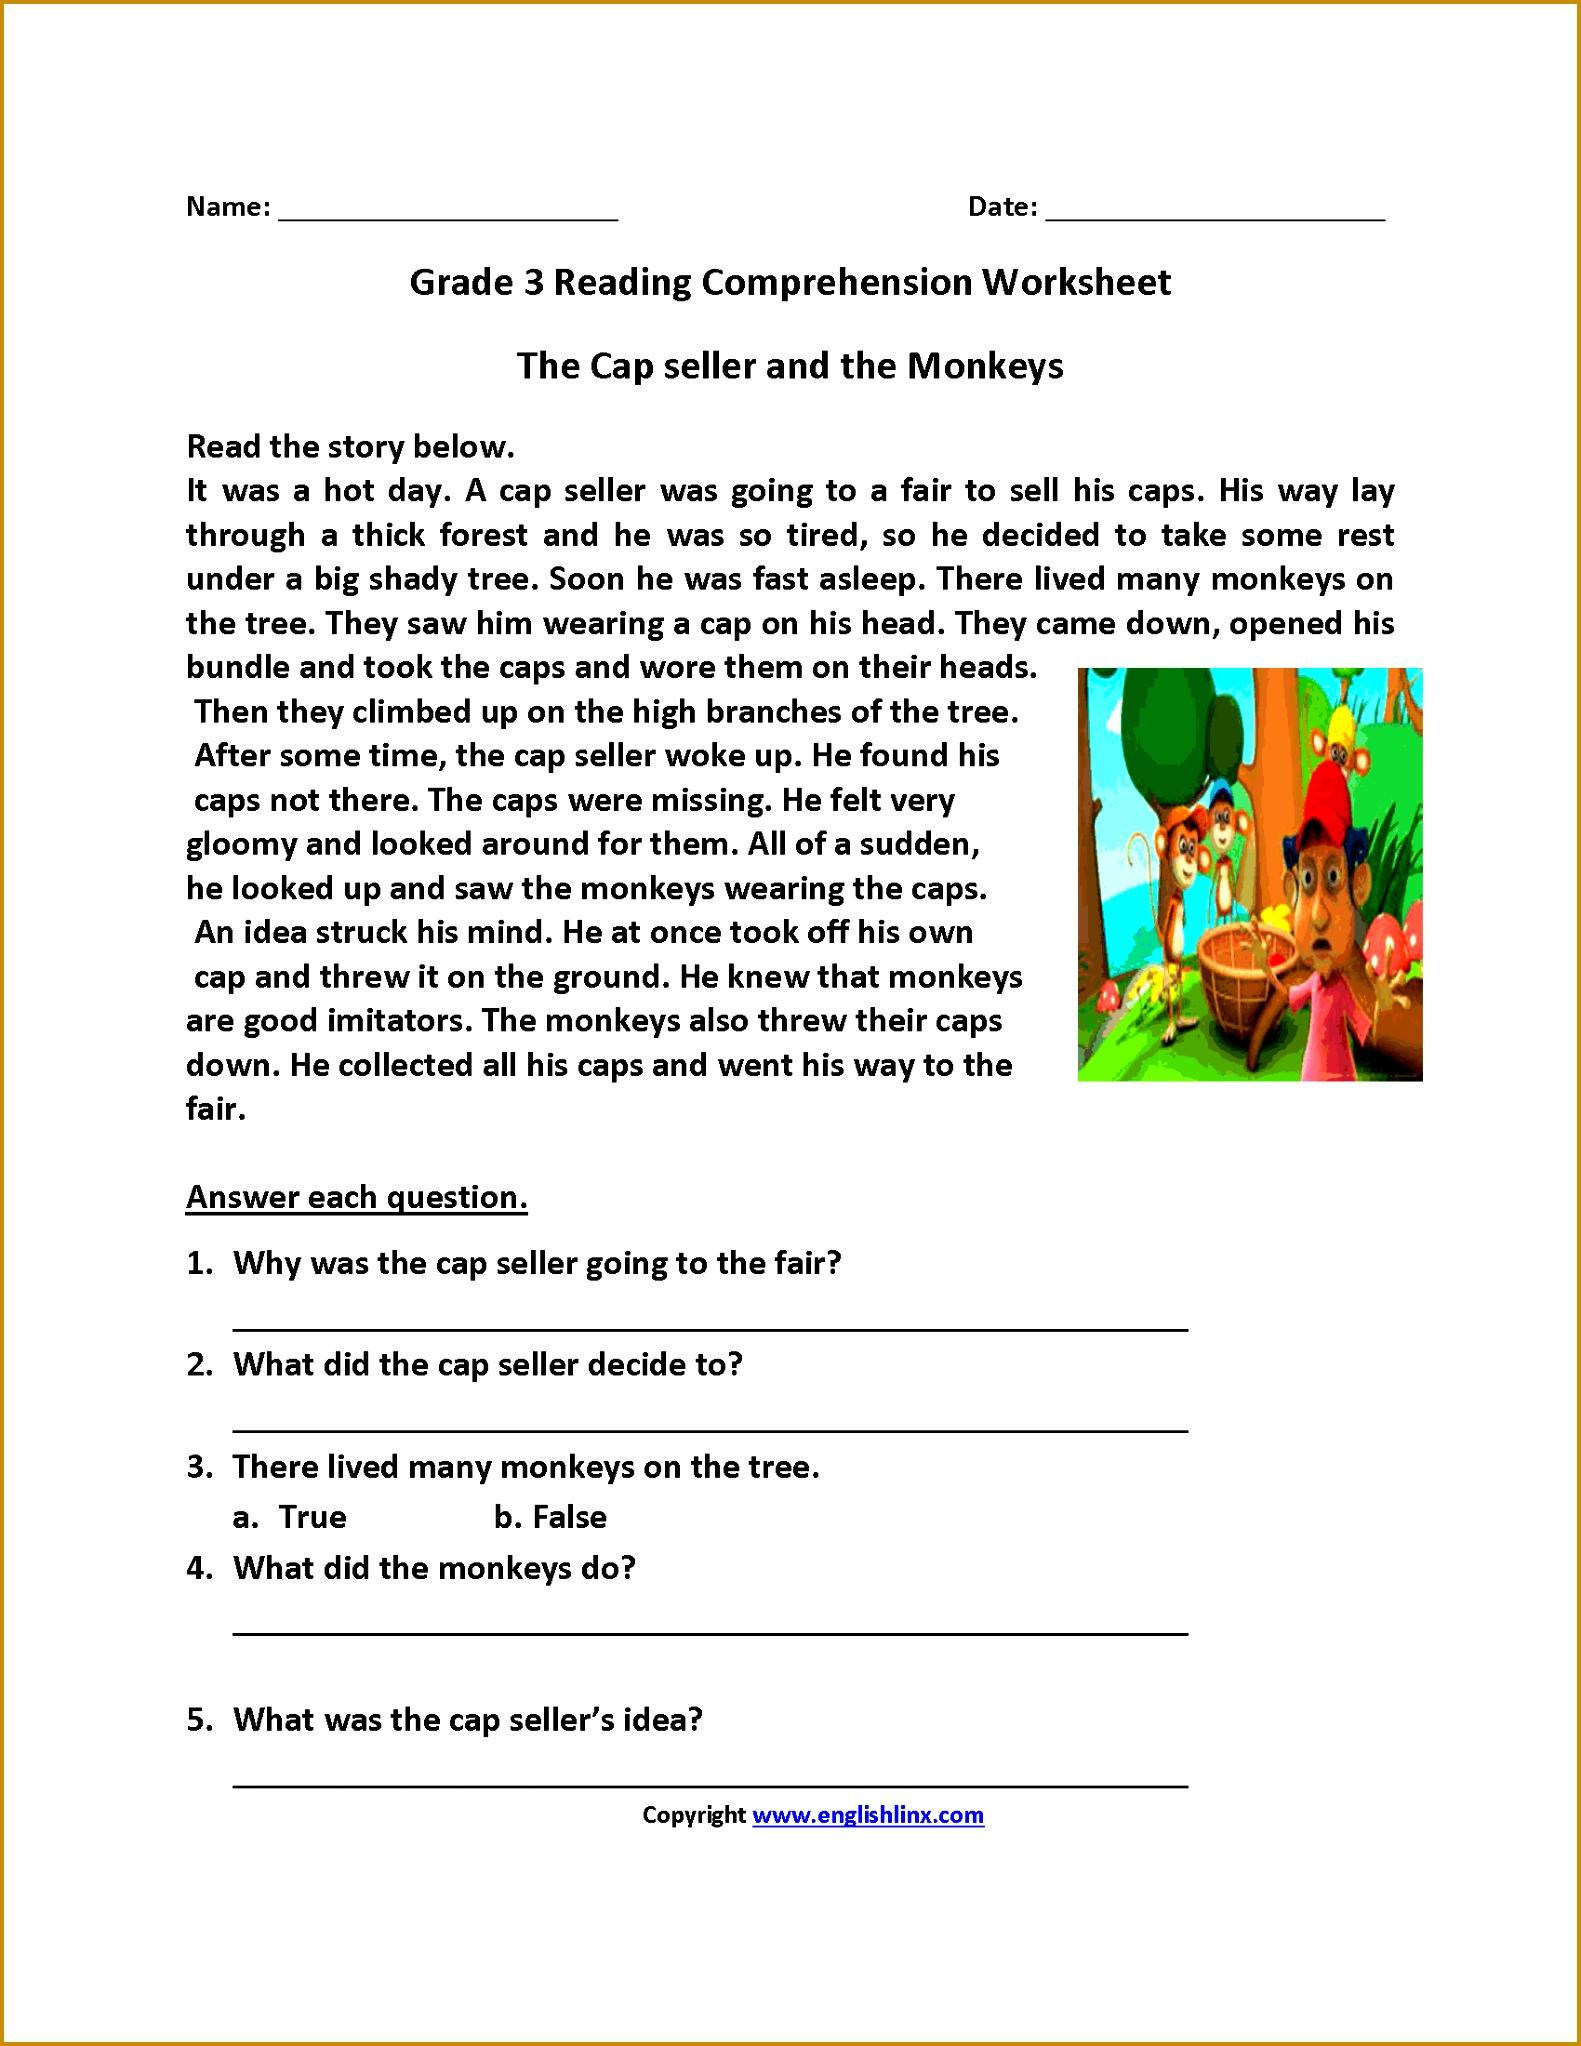 Cap Seller and Monkeys Third Grade Reading Worksheets 20461581